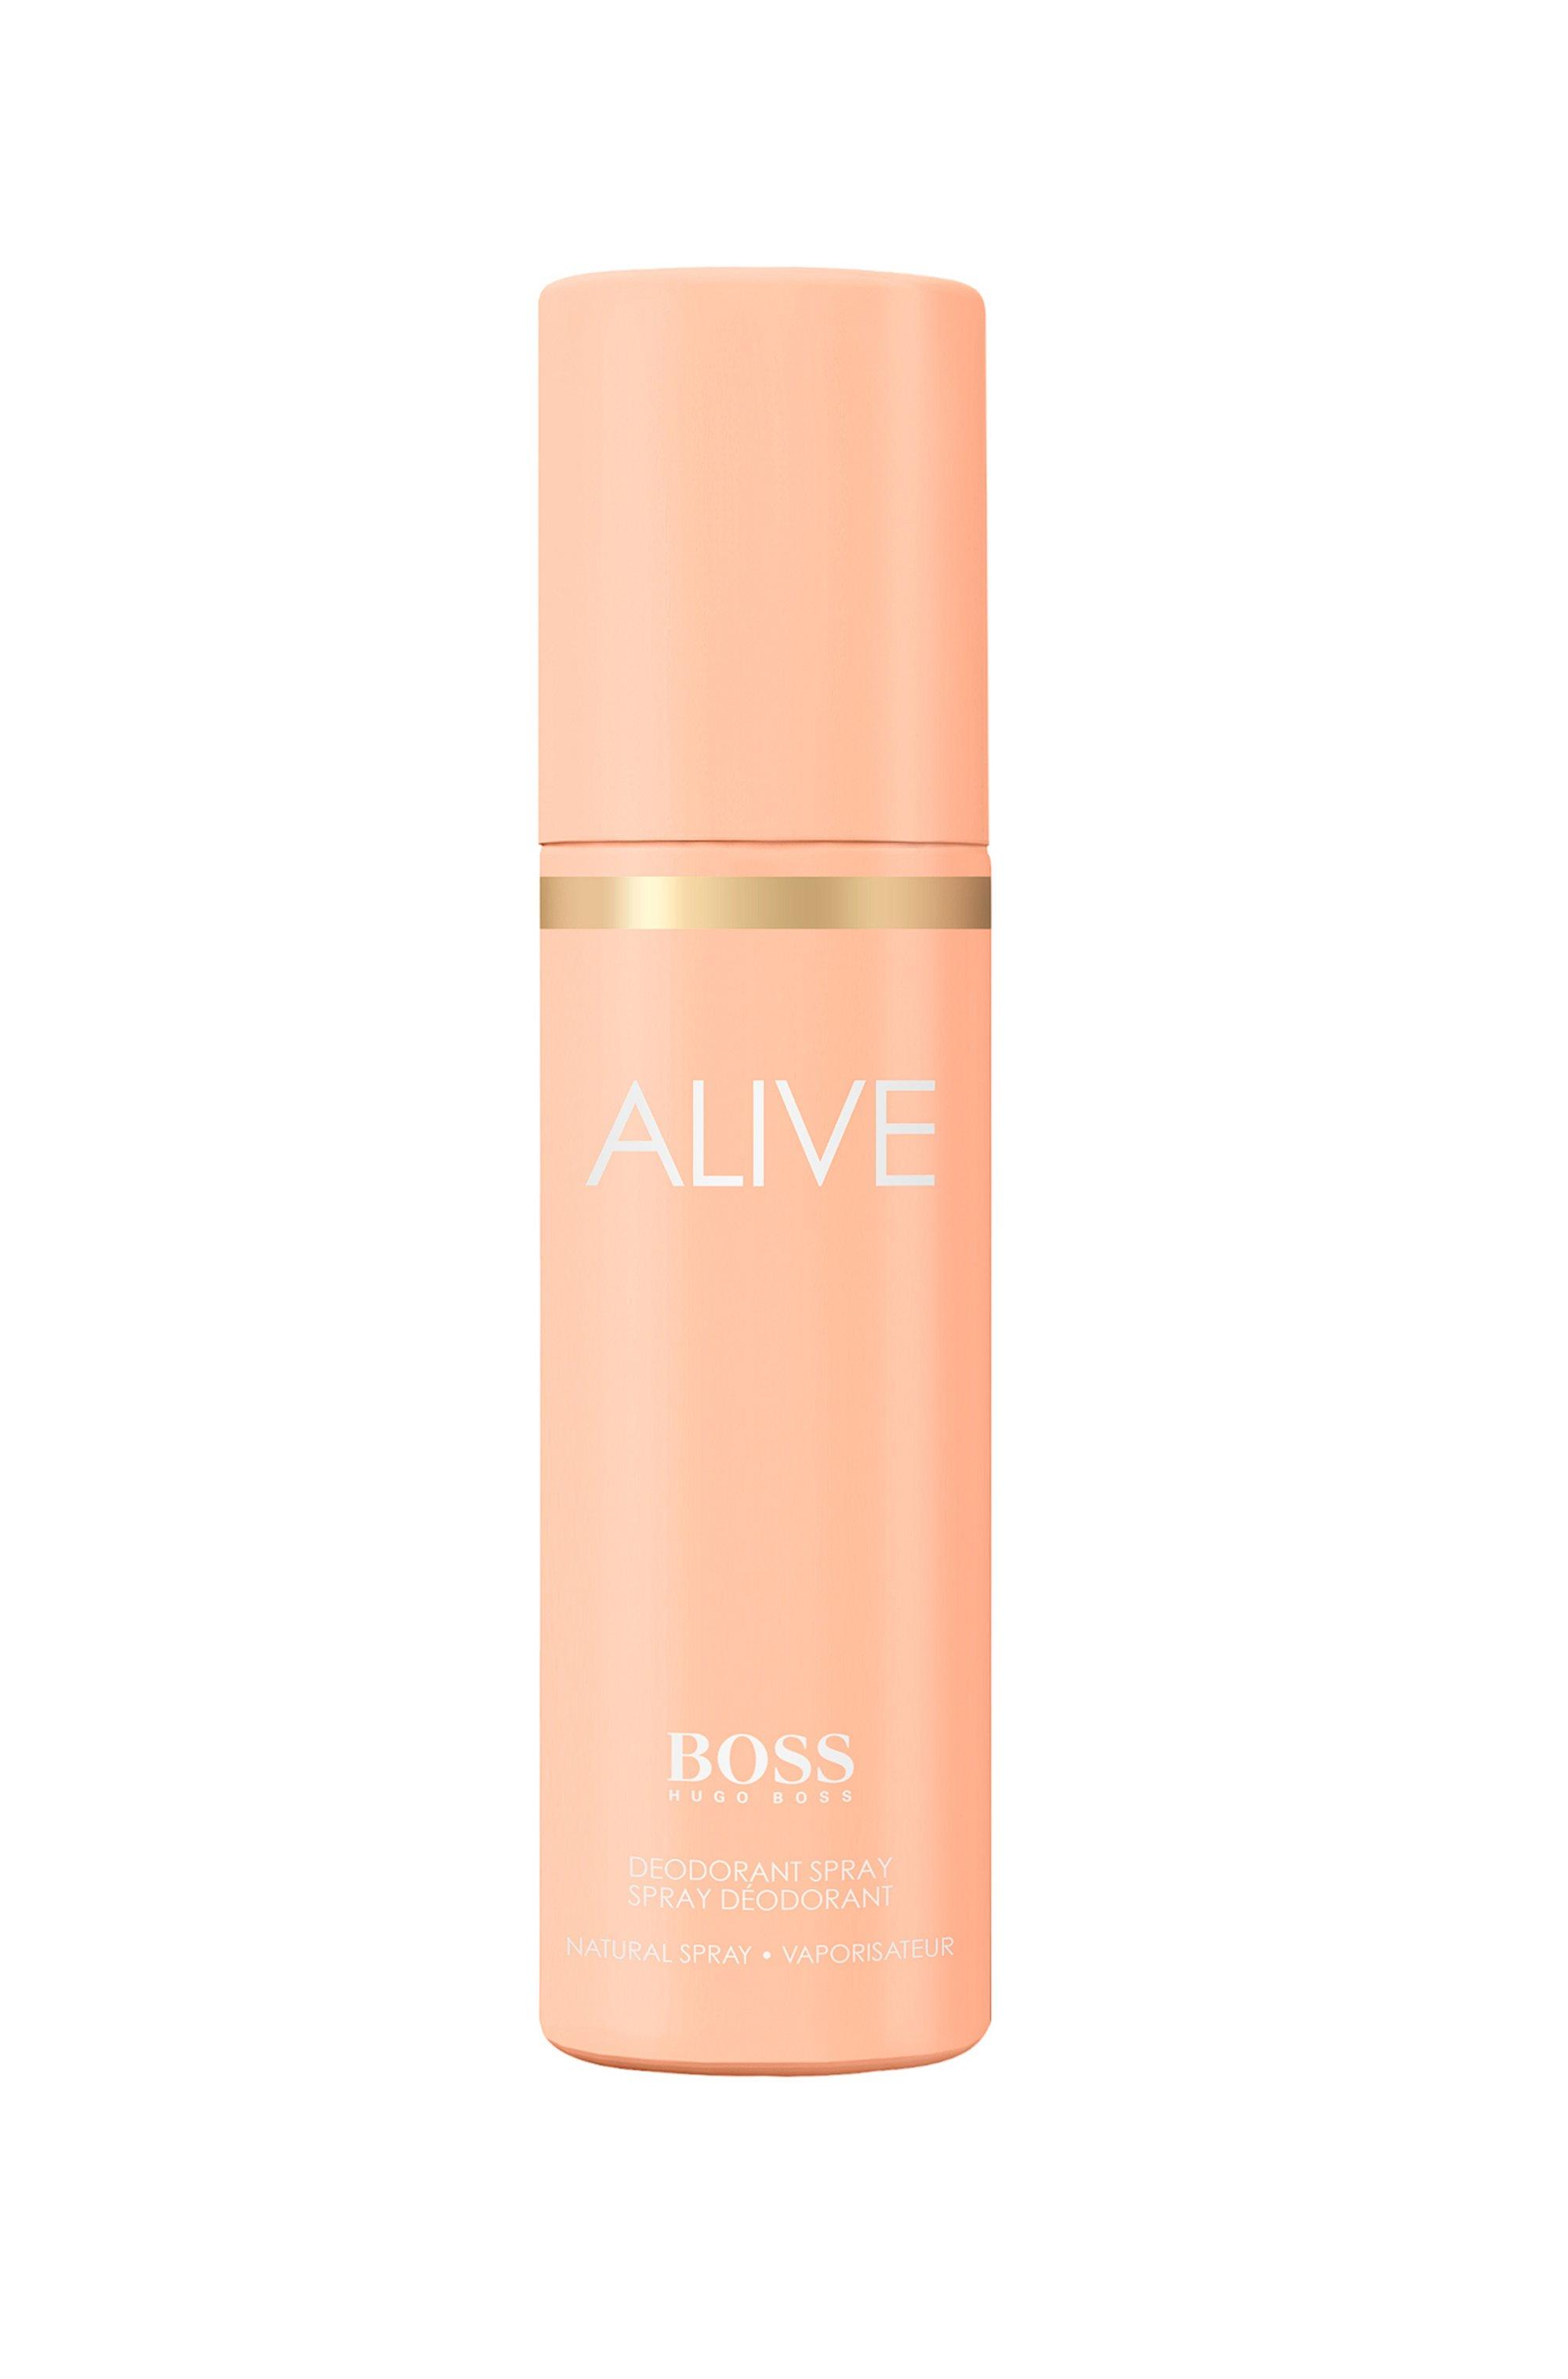 BOSS Alive deodorant spray 100ml